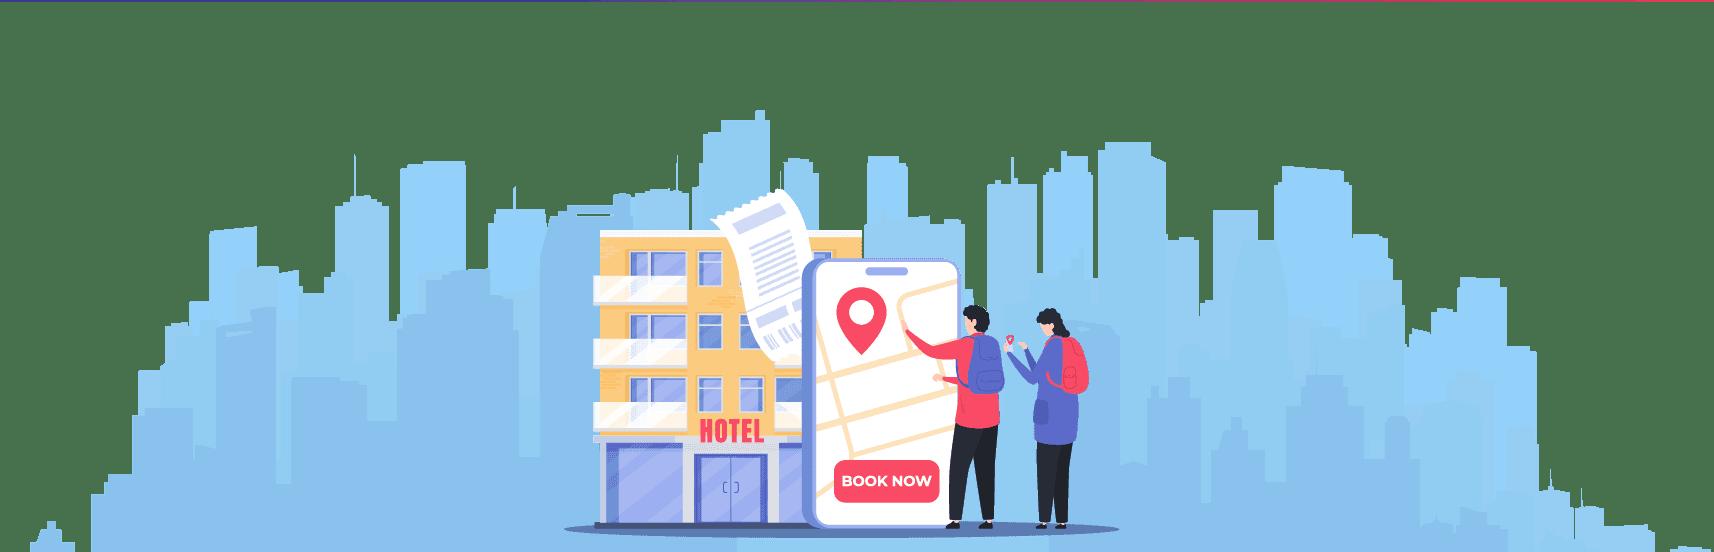 Hotel Marketing | Relevant Audience Digital Agency in Bangkok